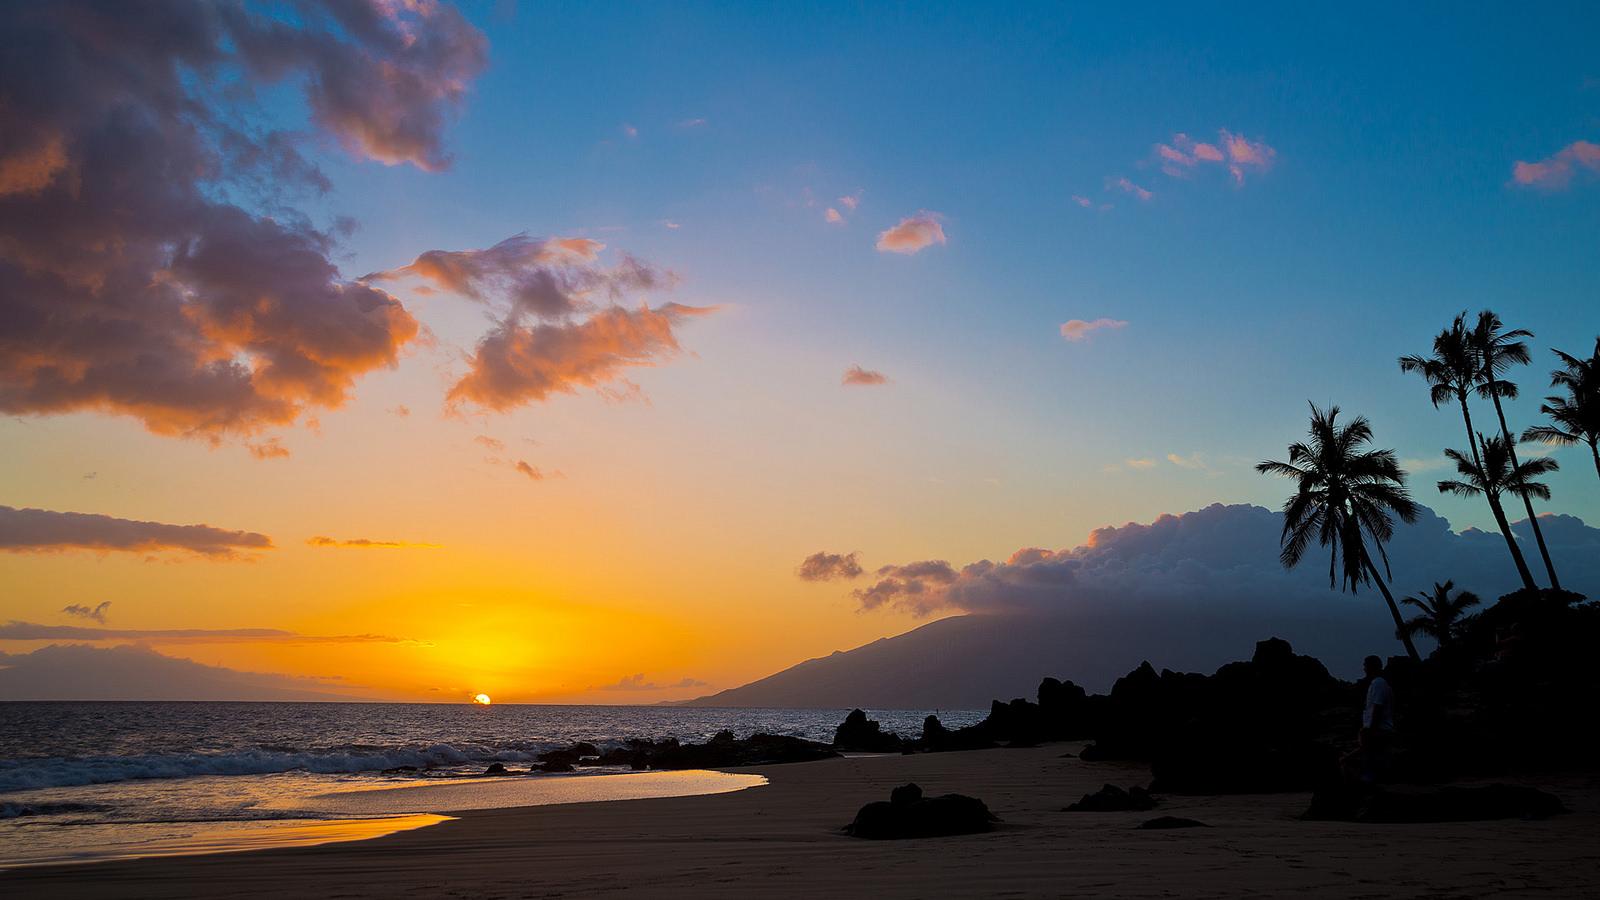 Maui Sunset, Ruediger Gros